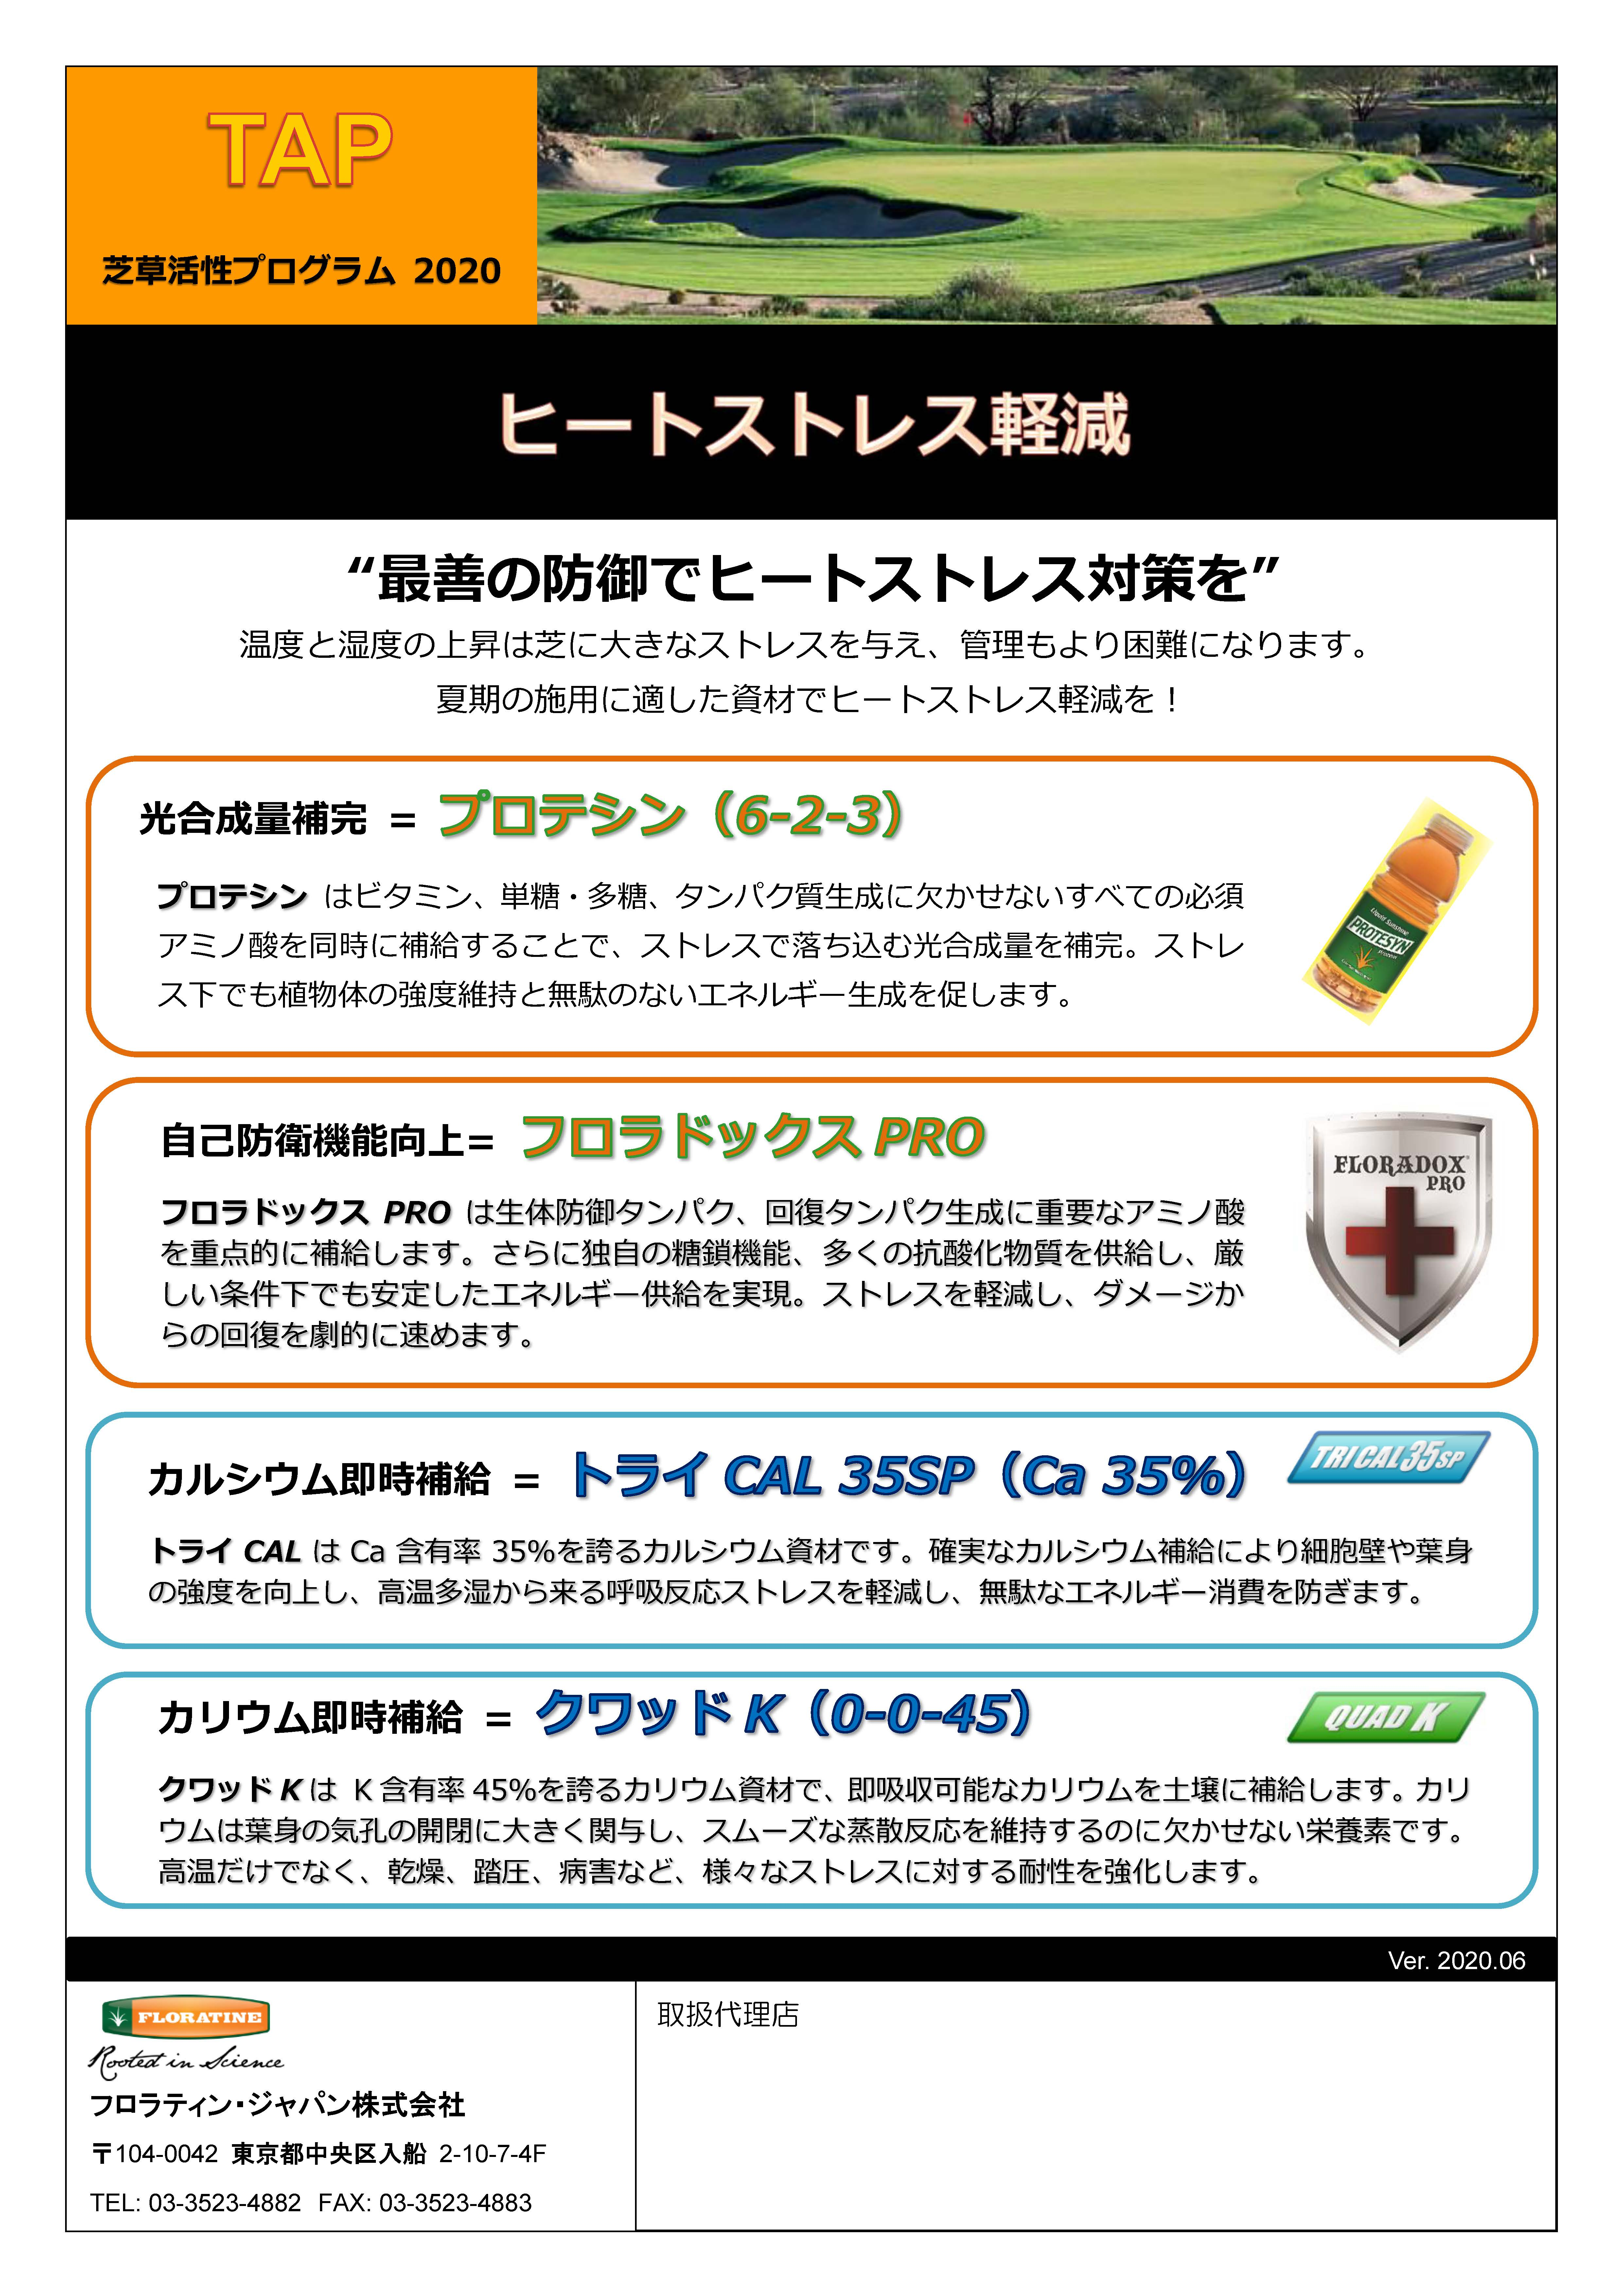 2020.07 TAP ヒートストレス軽減(土壌).docx